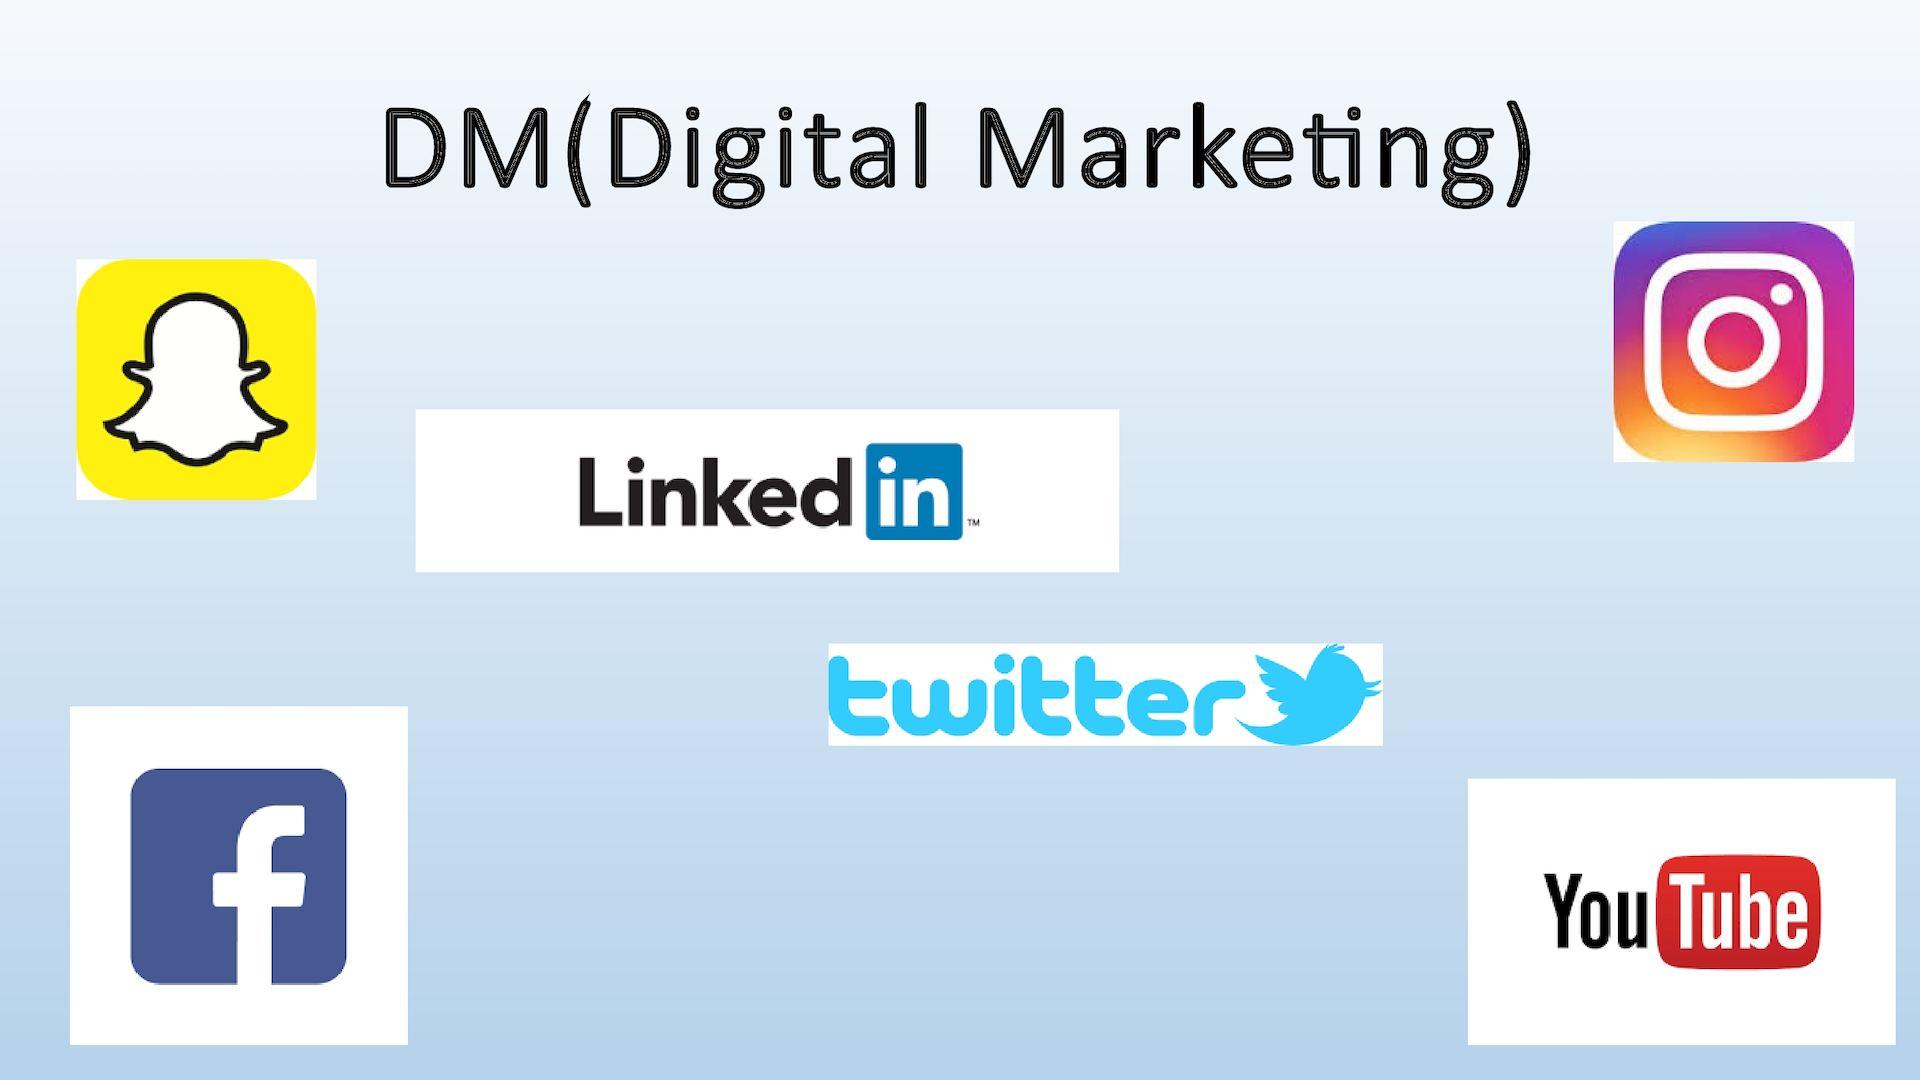 Calaméo - Dm(digital Marketing) Ppt